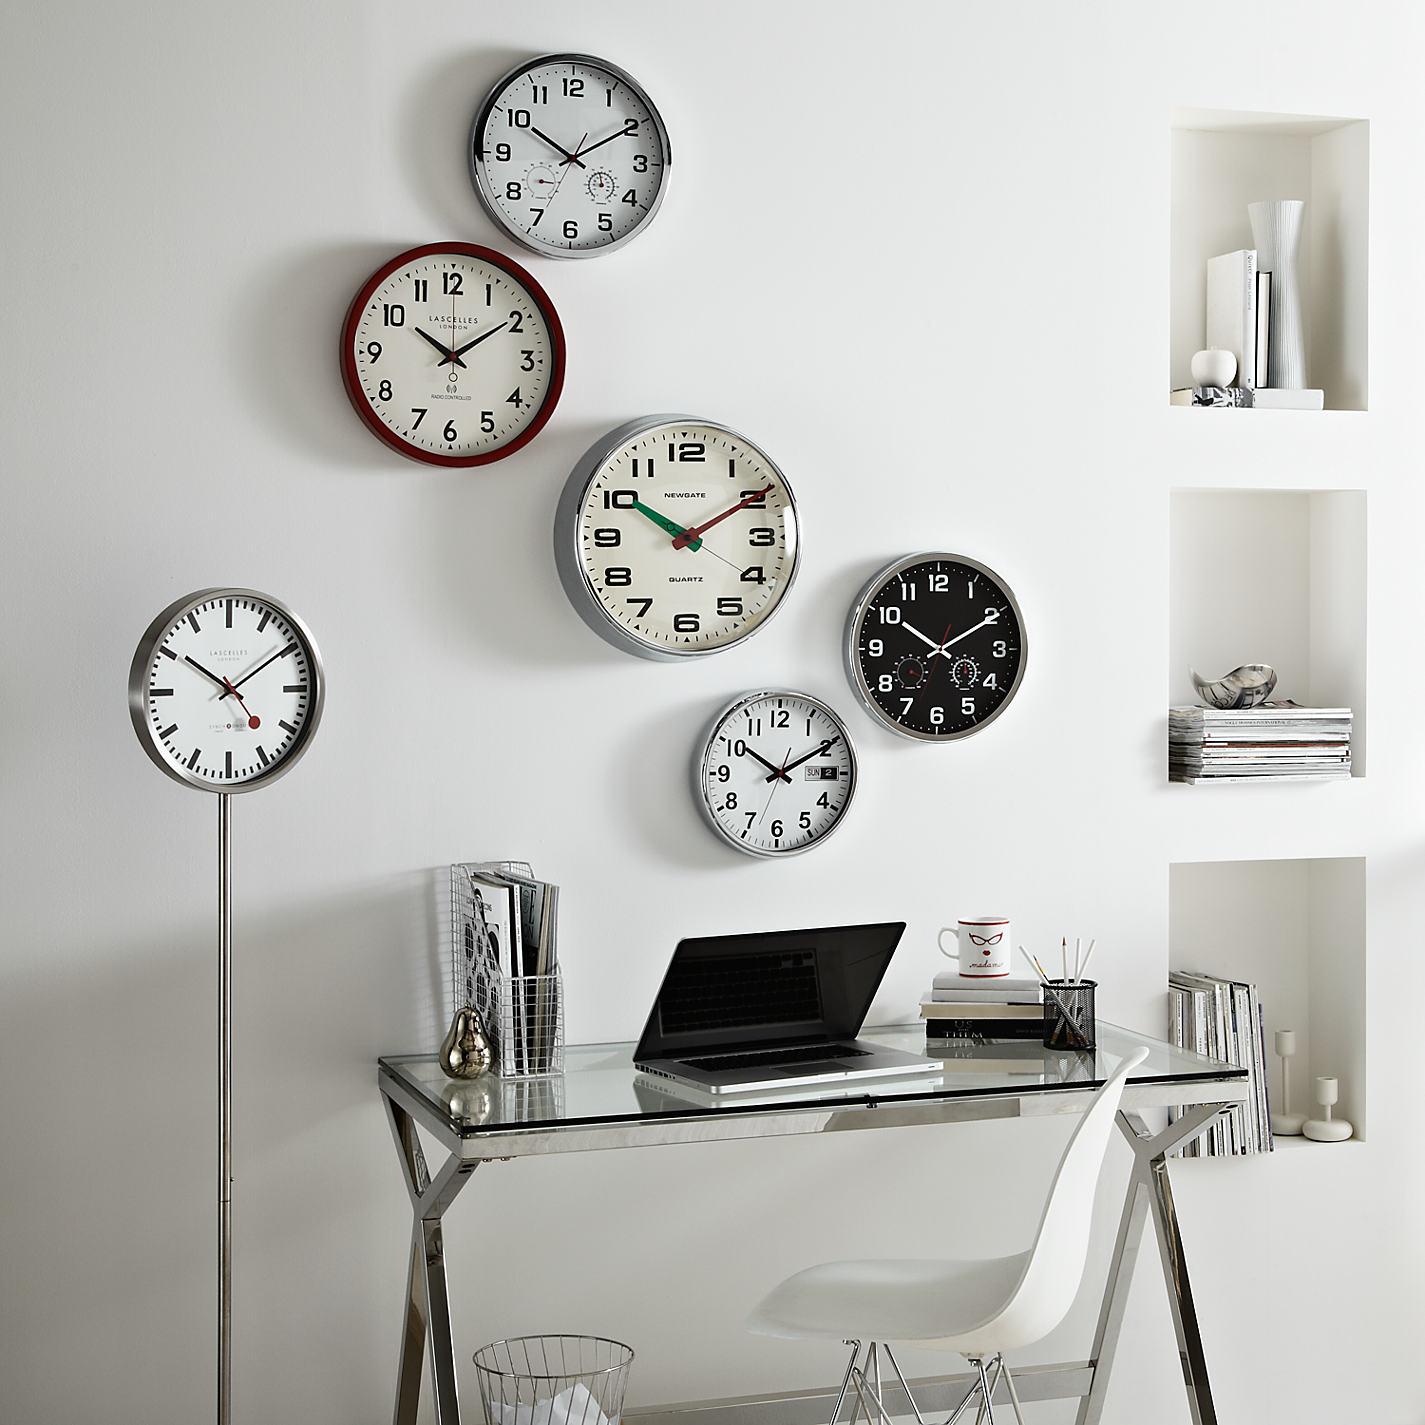 Brixton wall clock cbaarch brixton wall clock cbaarch amipublicfo Gallery